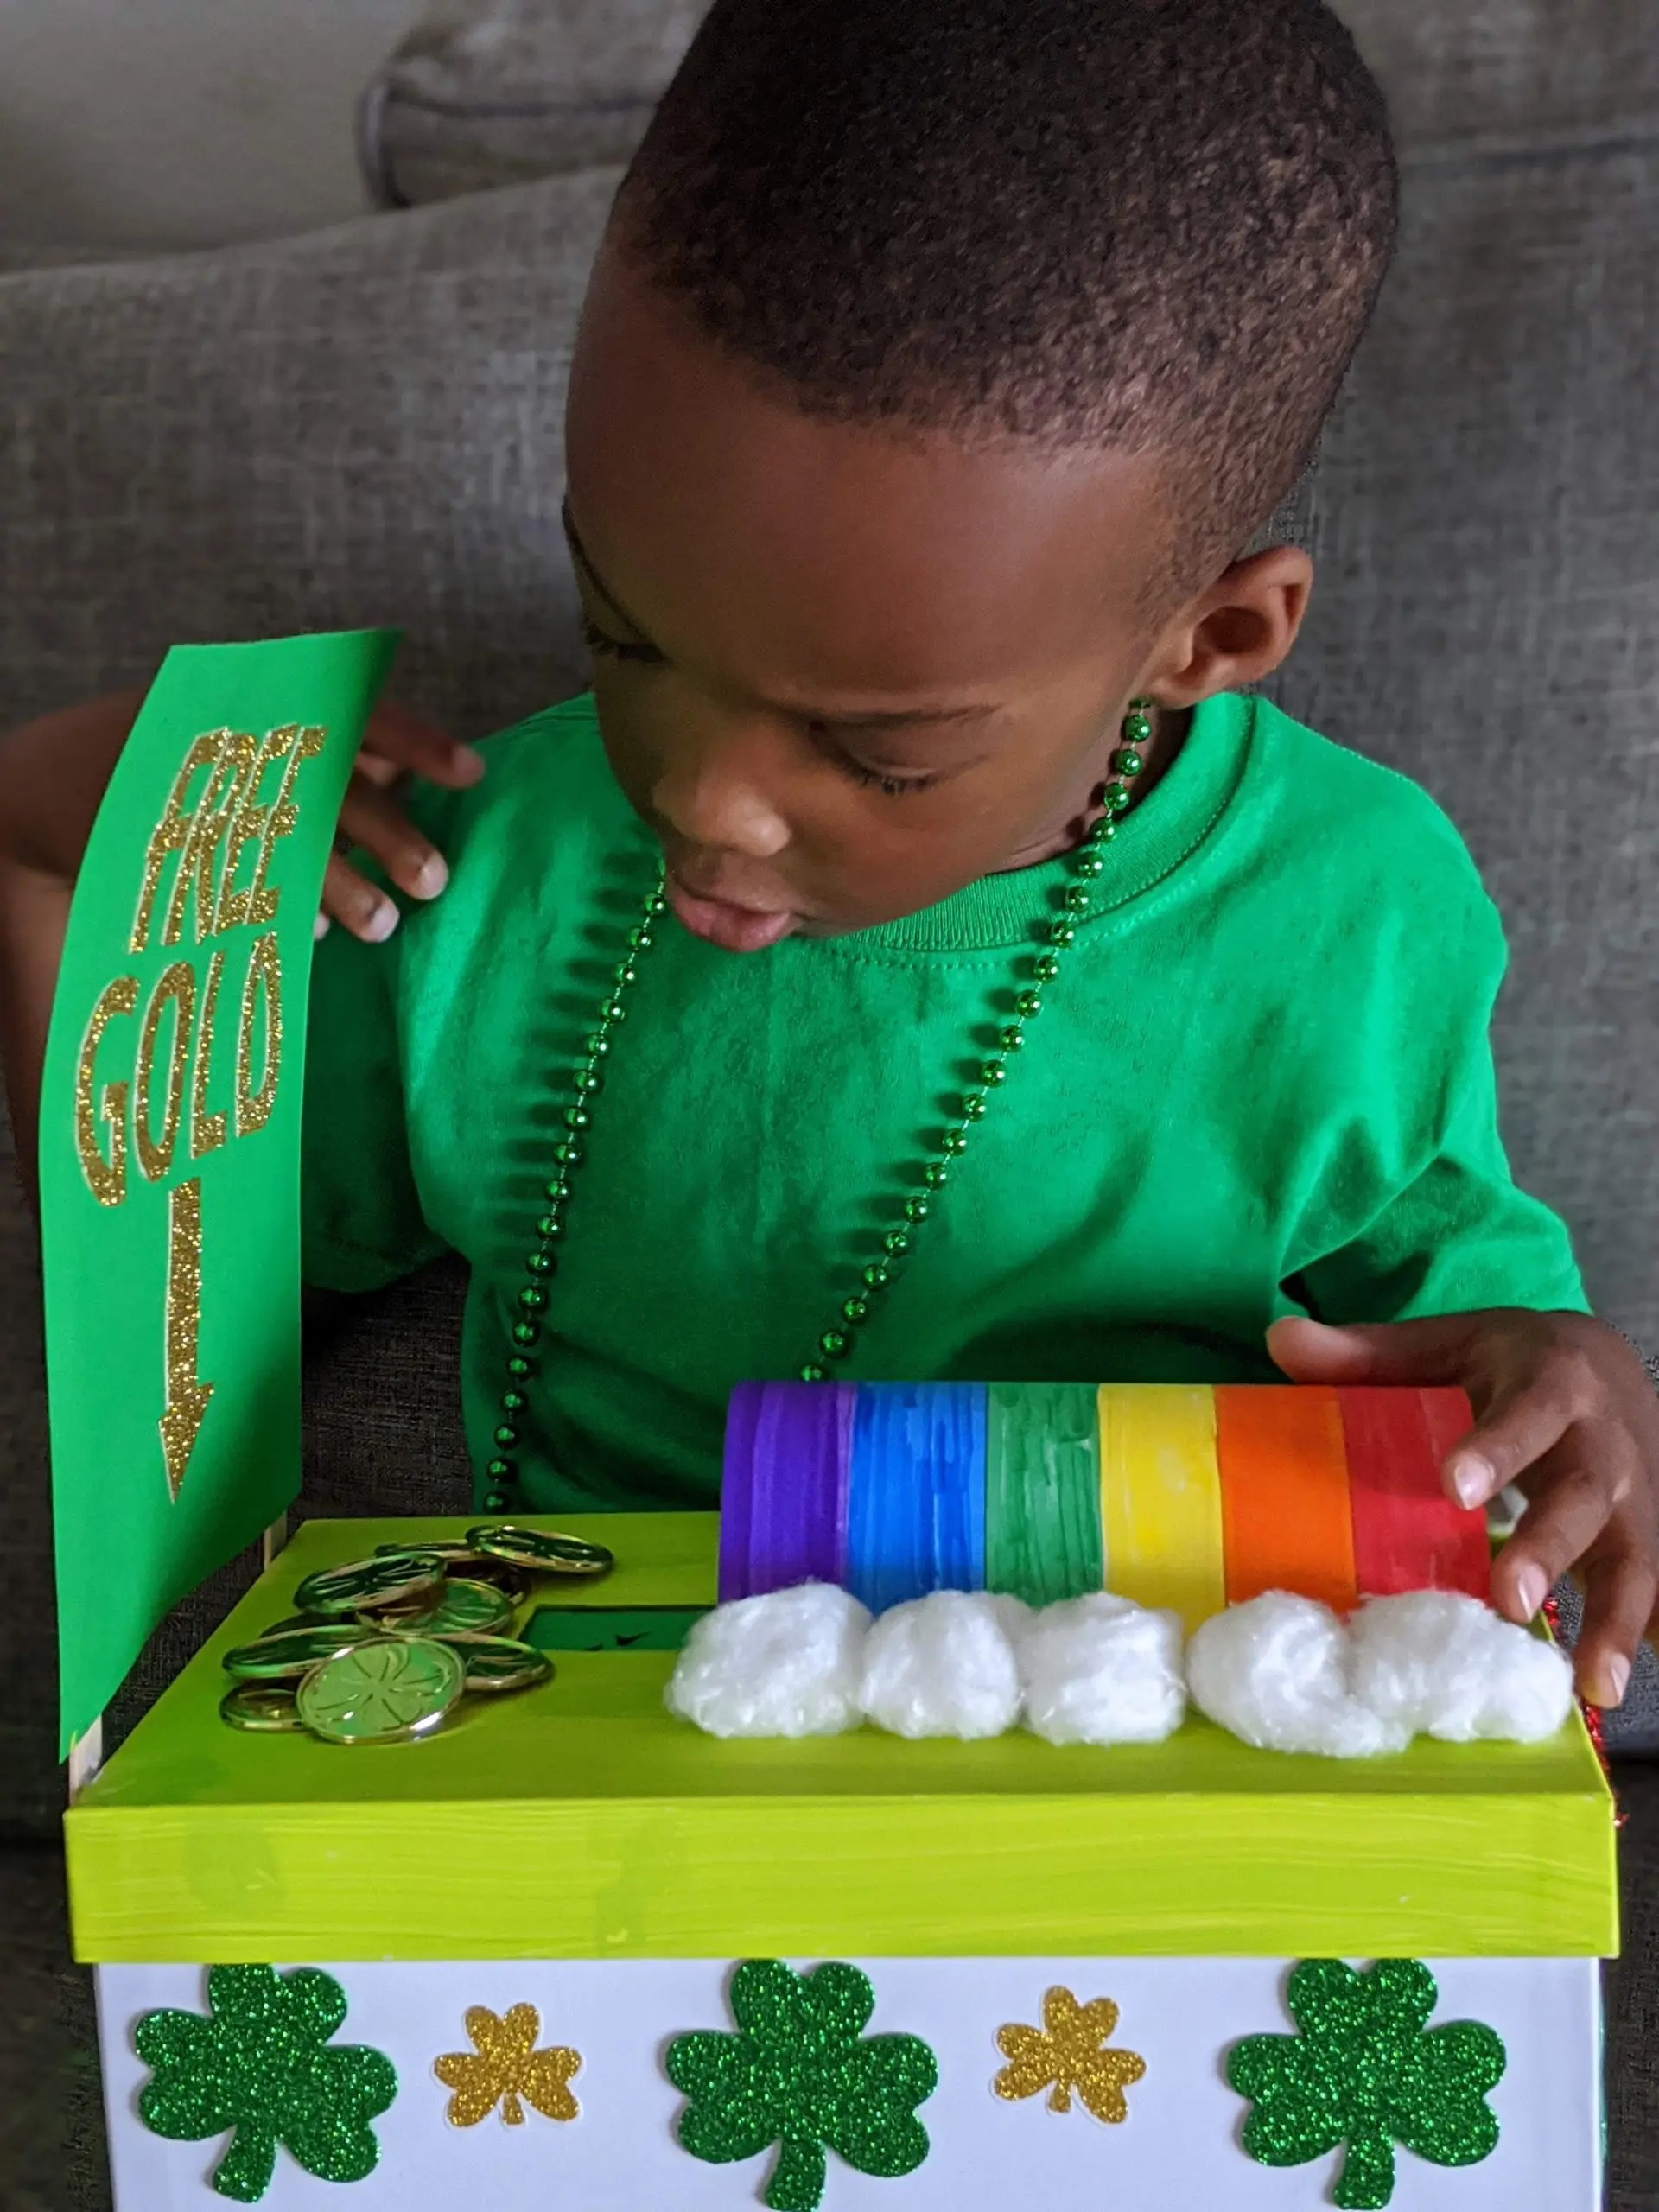 Black boy holding DIY leprechaun trap